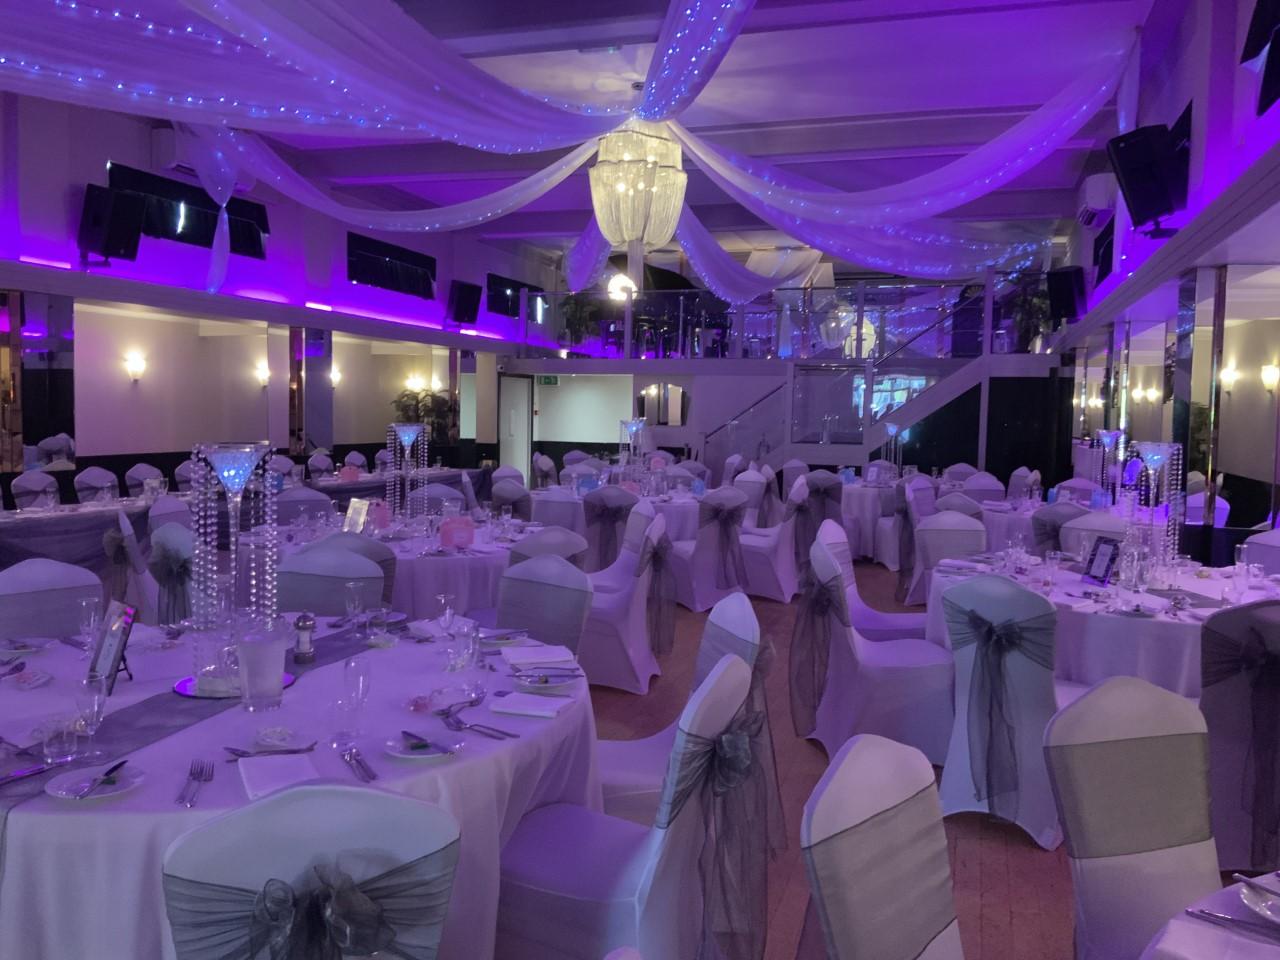 Purple and White Wedding Reception - Rosie and Daniel's Wedding 24th August 2019 - Arlington Ballroom Southend